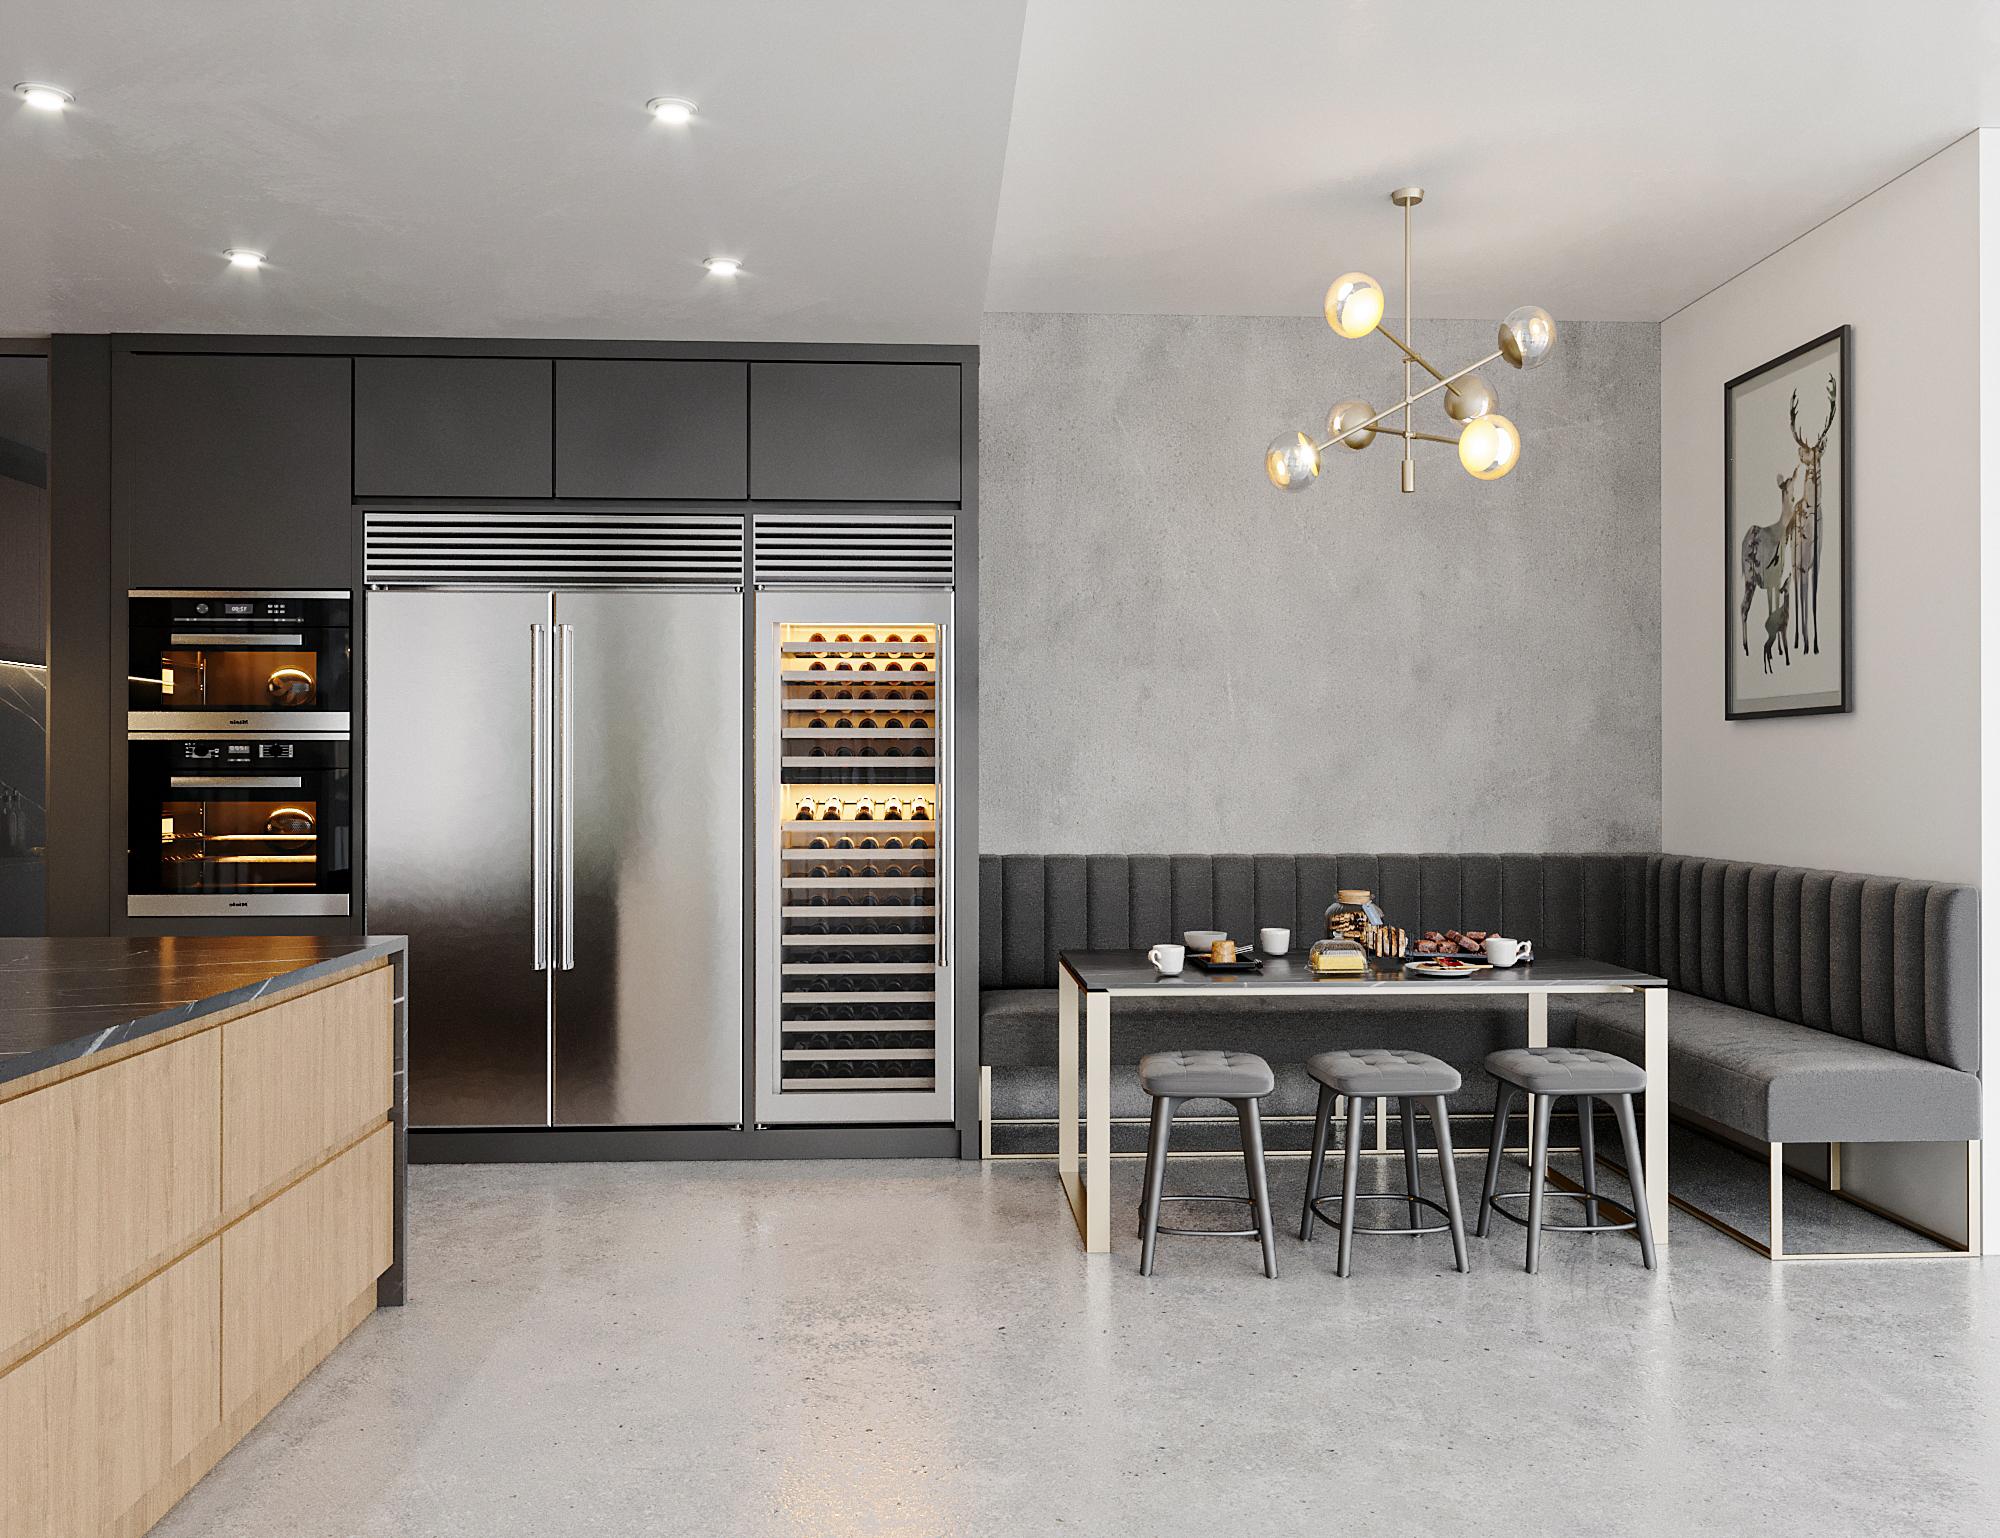 orla studios kitchen 2